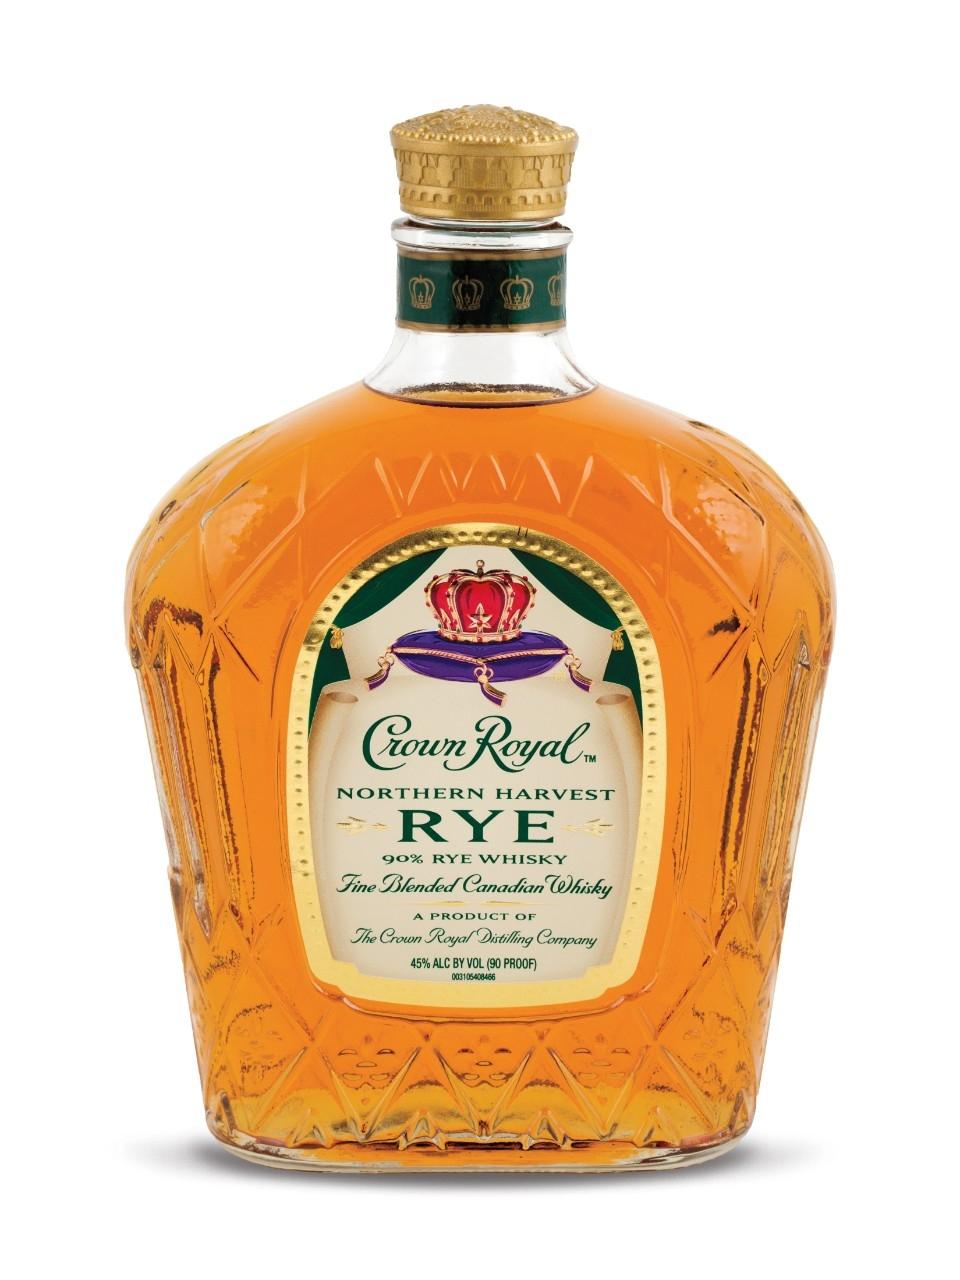 Whisky lovers keeping LCBO shelves bare